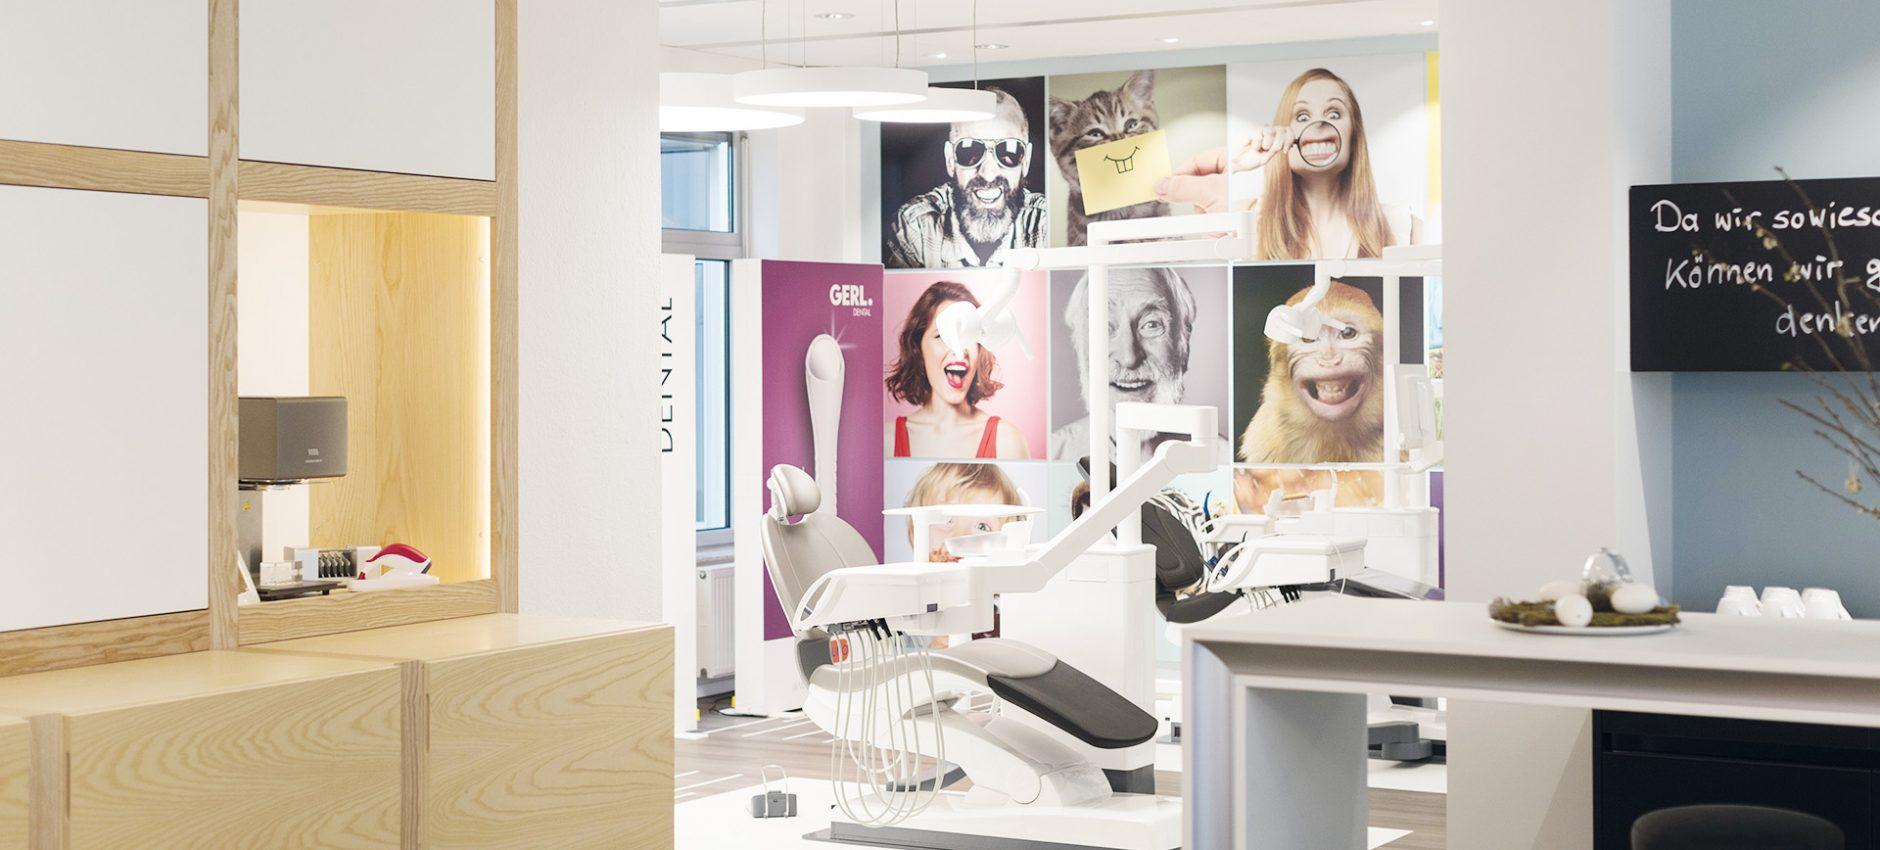 0005_GERL_DentalShowroom_Smilewand_1920x1000_72dpi.jpg